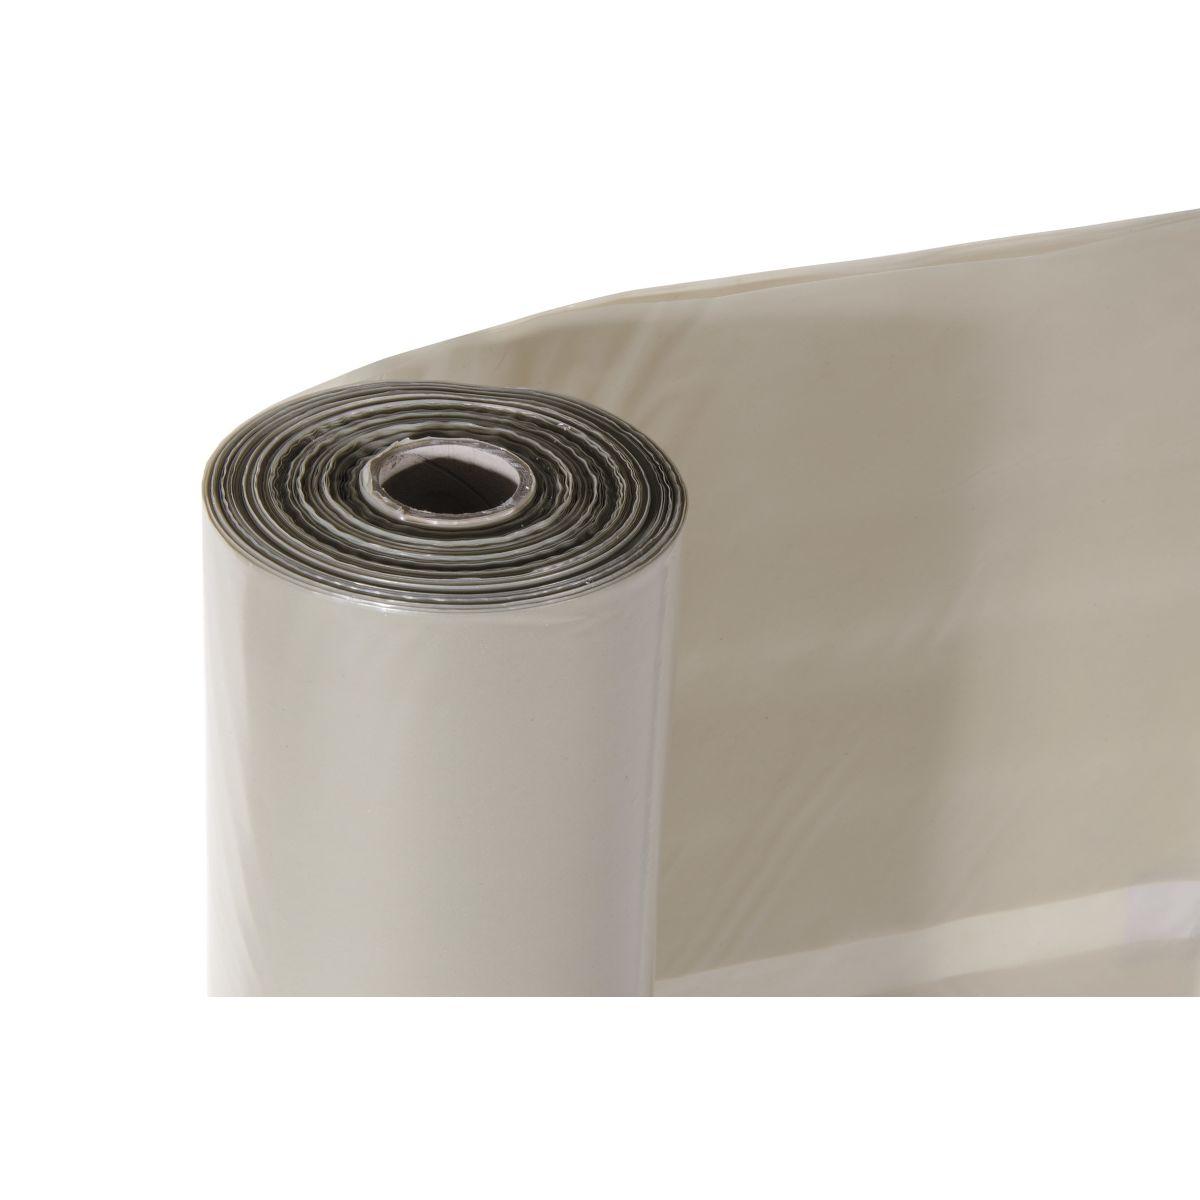 Tende a metraggio leroy merlin tappeti cucina leroy for Profilo alluminio led leroy merlin